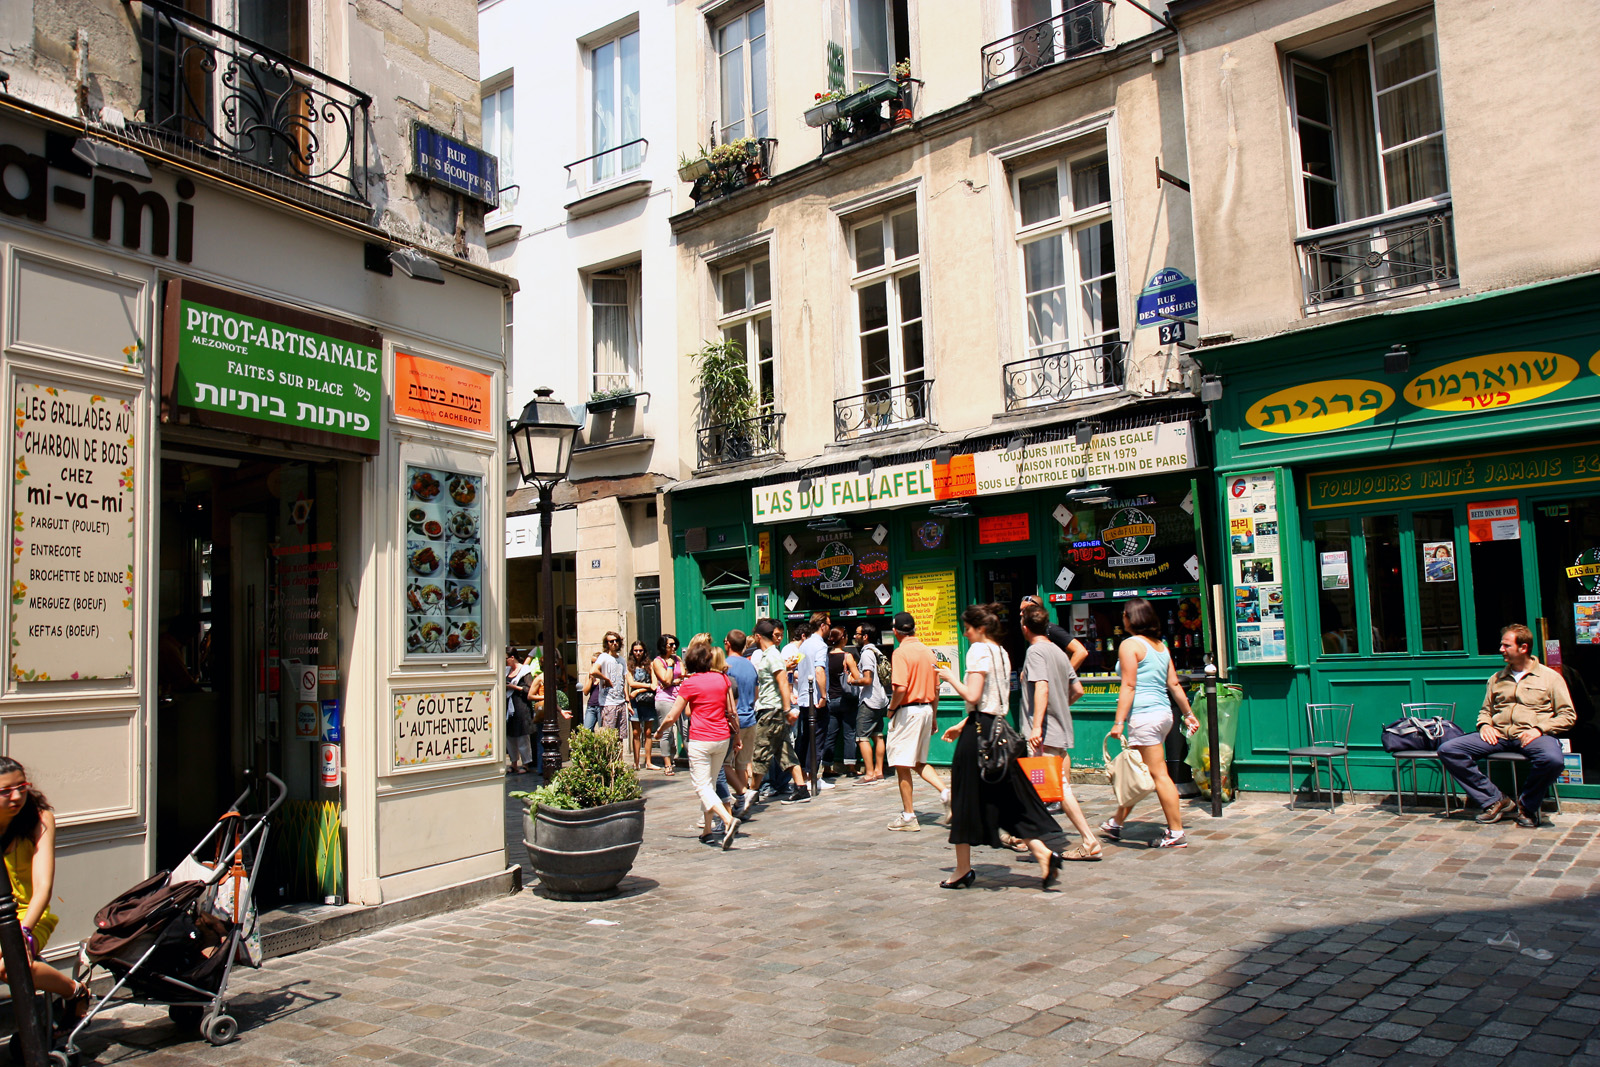 European Restaurants Near Alsip Il